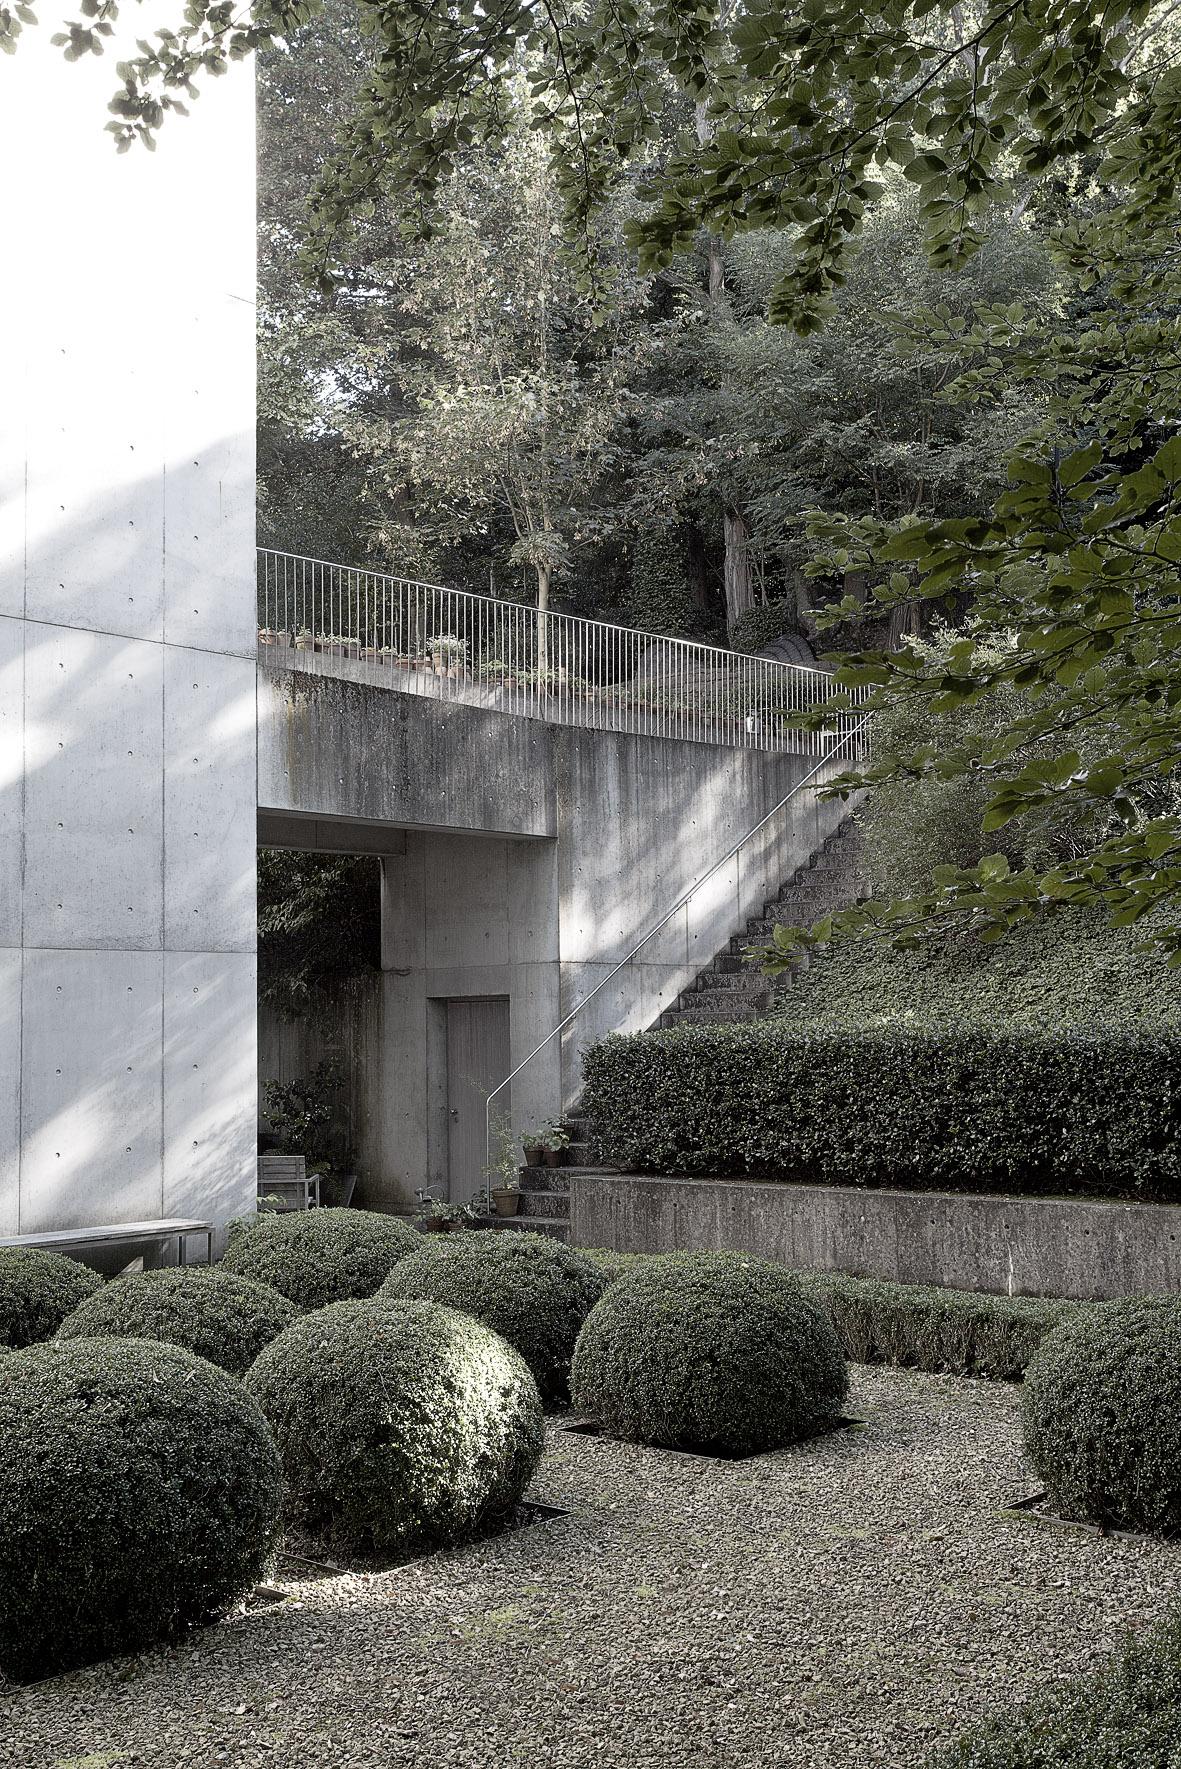 architecte_bruno_albert_serge_delsemme_photo_caroline_dethier_14.jpg